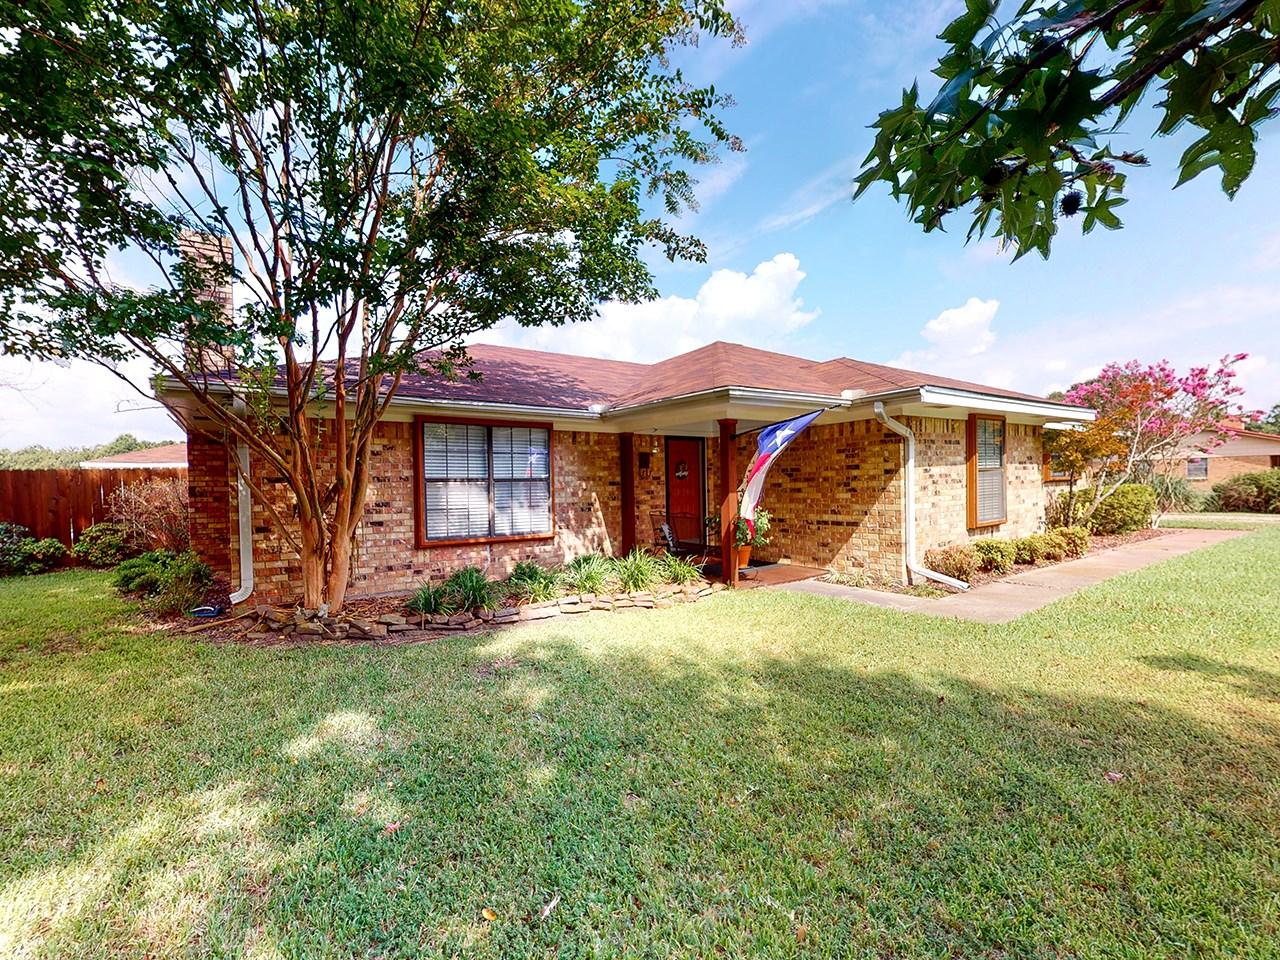 Country Home for Sale Lamar Co Blossom Texas NE Texas